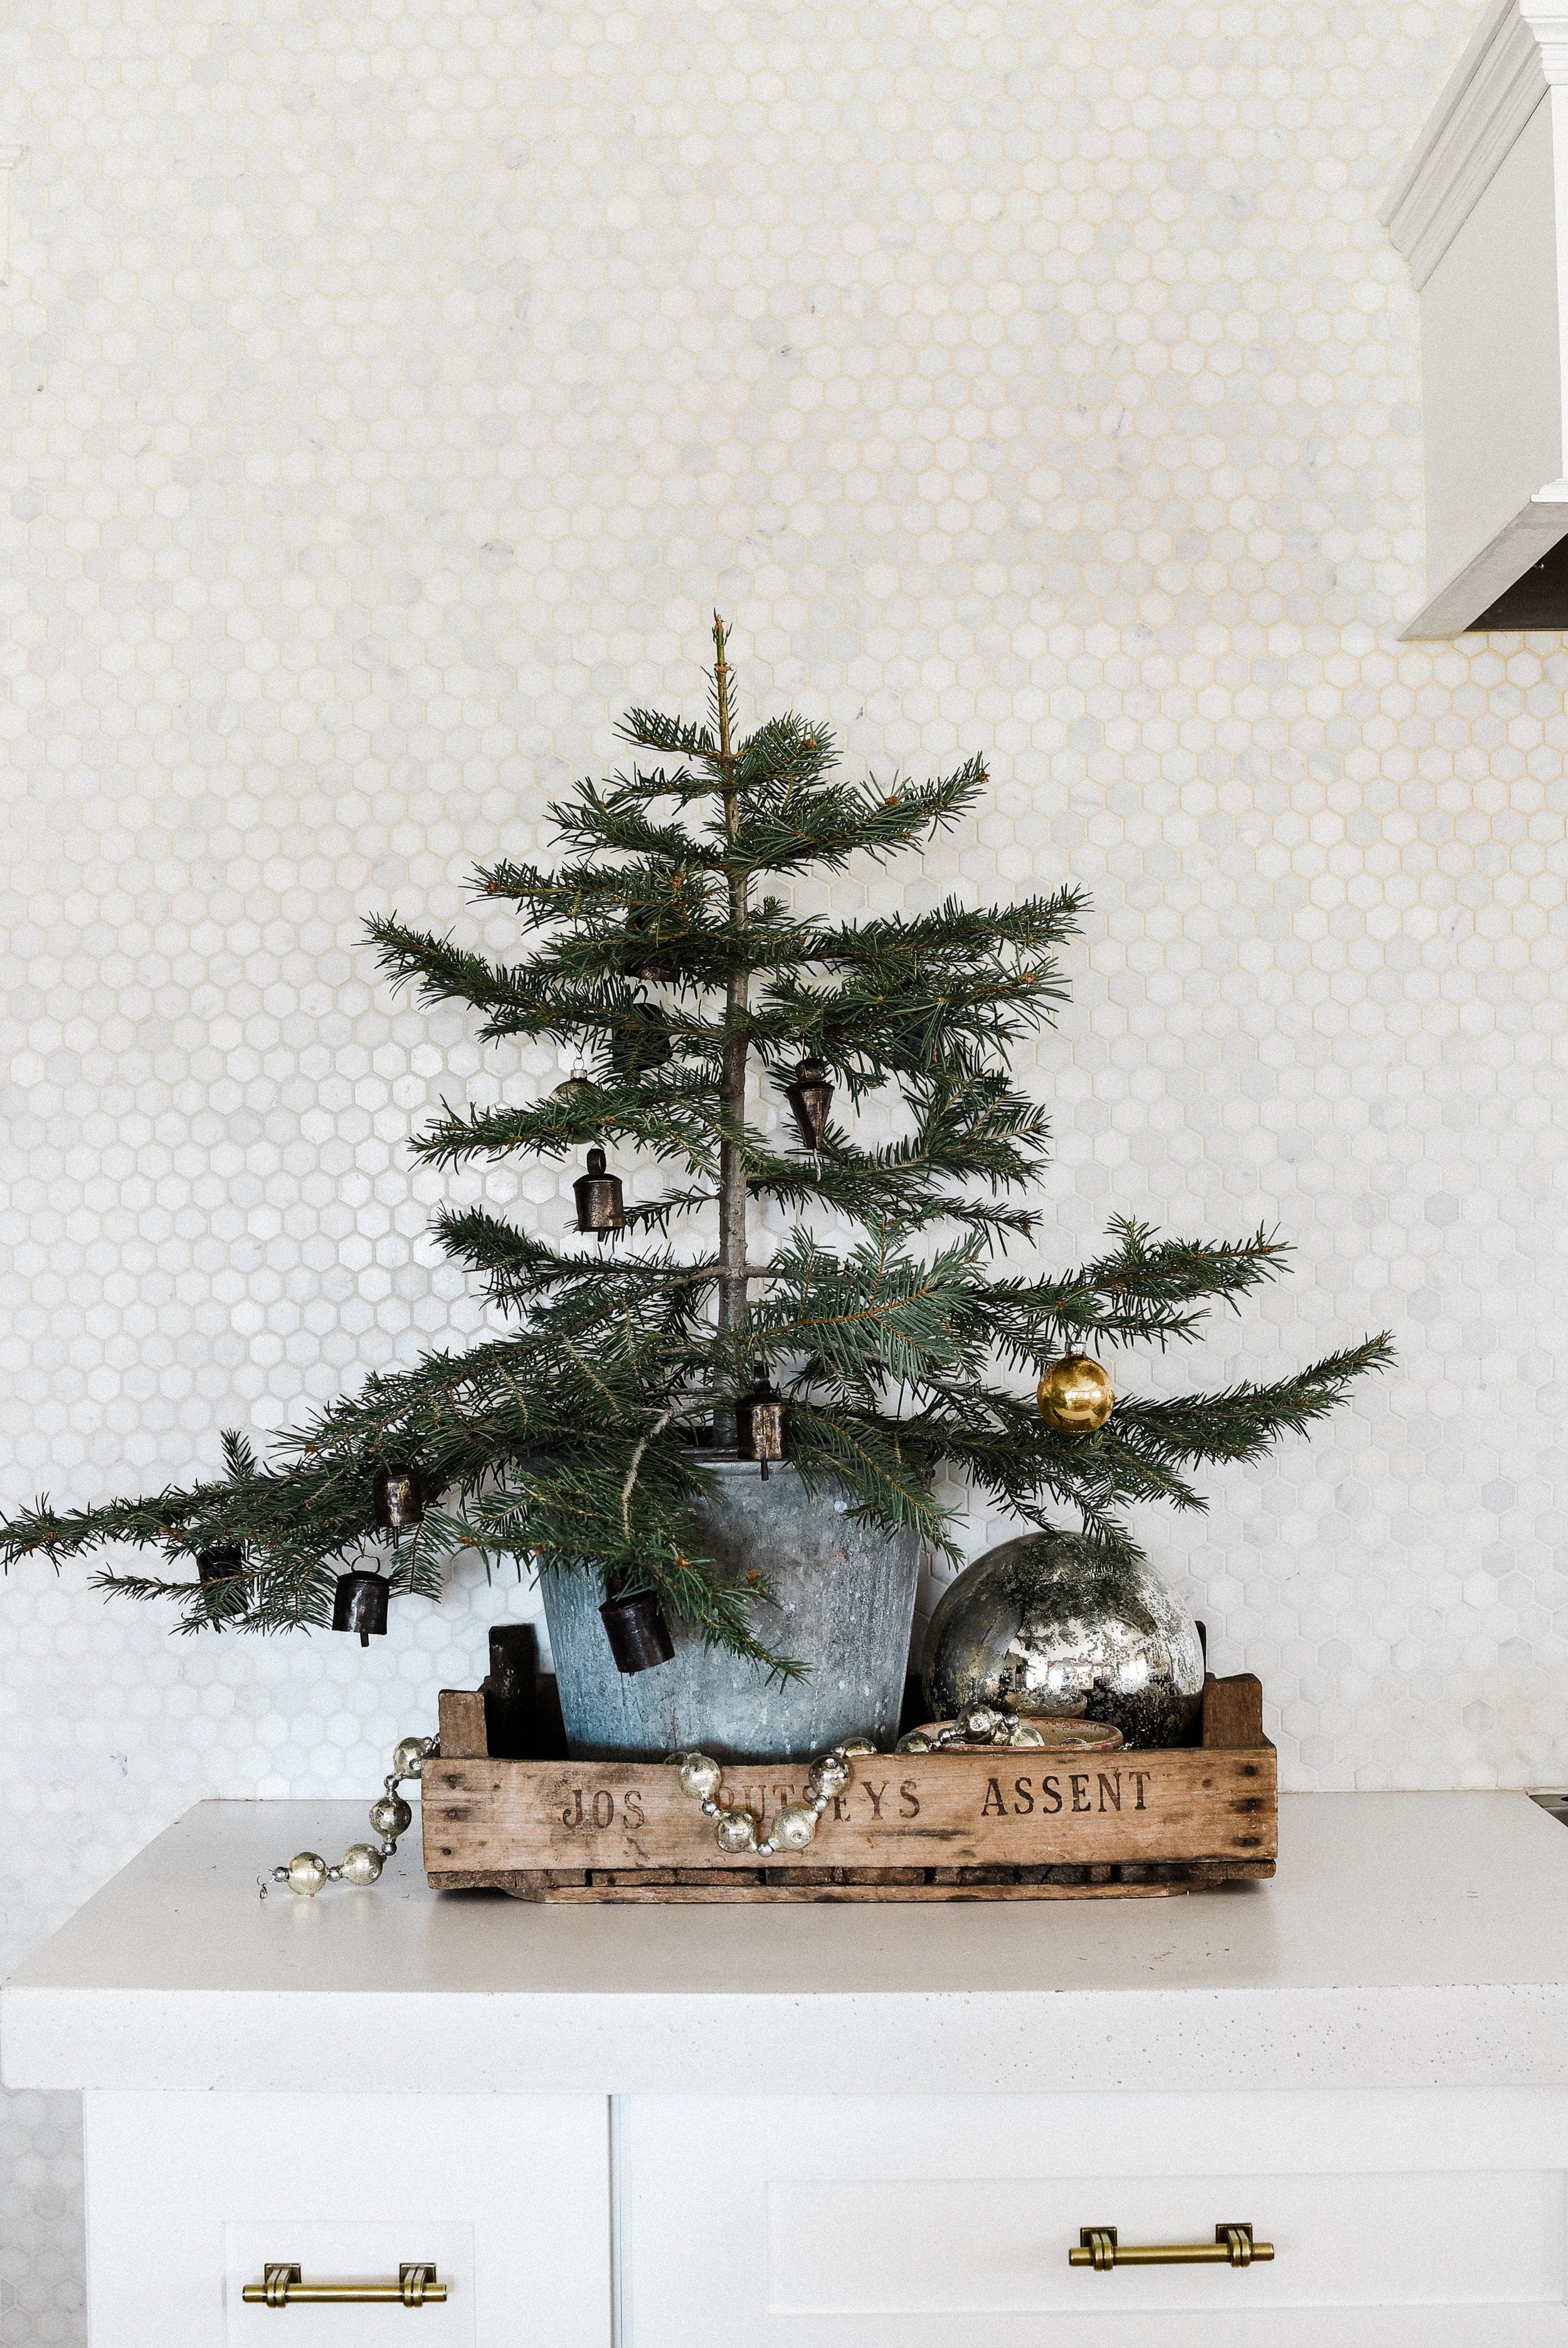 Tiny Scandinavian Christmas tree decorating idea in a zinc bucket for a minimalistic Christmas   boxwoodavenue.com #christmastreedecor #ScandinavianChristmasTree